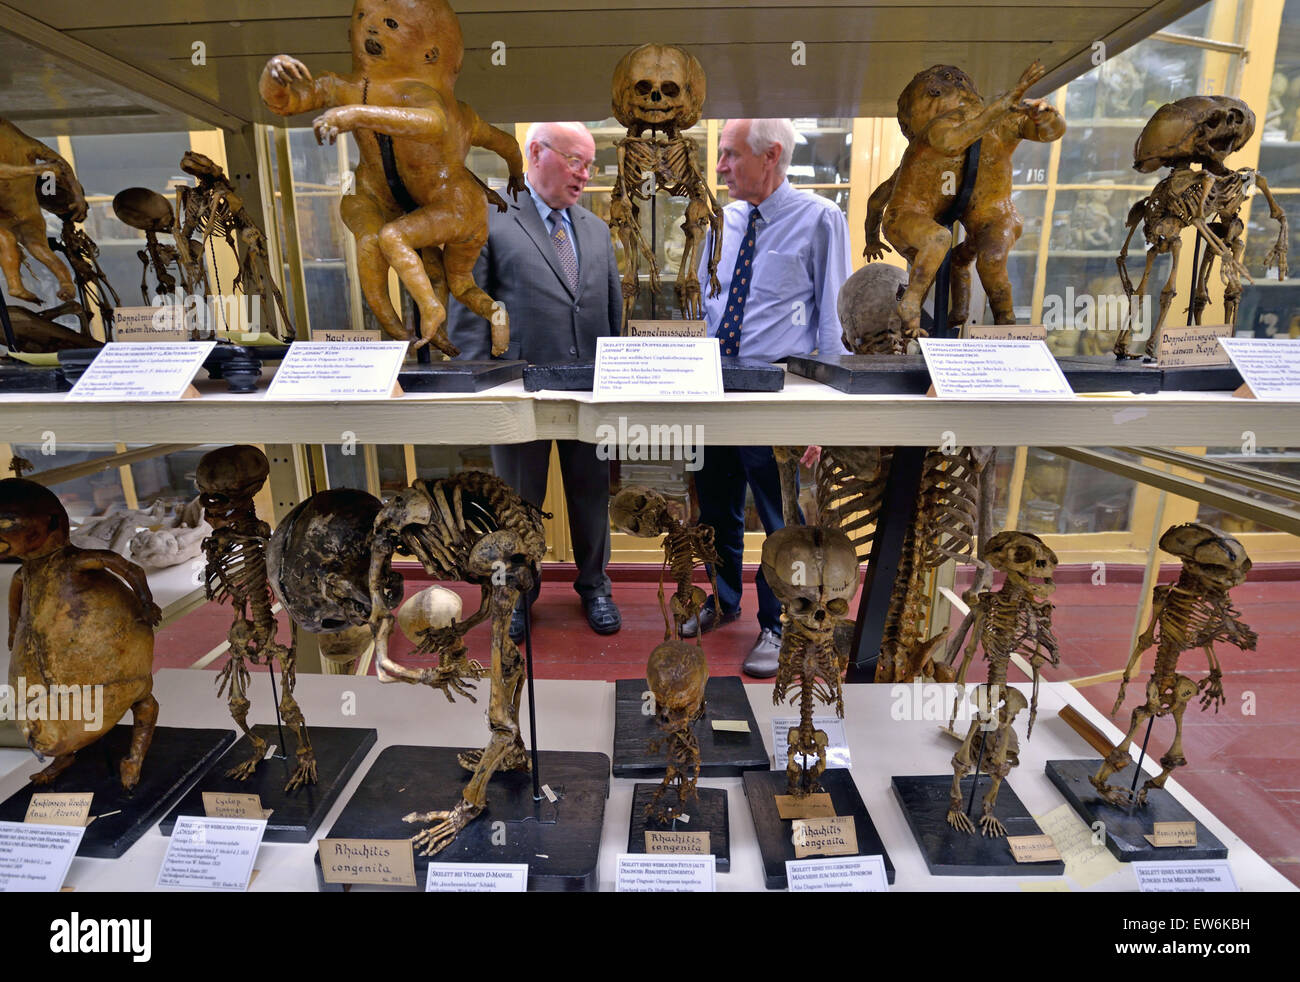 Profesor de anatomía Ruediger Schultka (L) y Bernd Fischer, Director ...